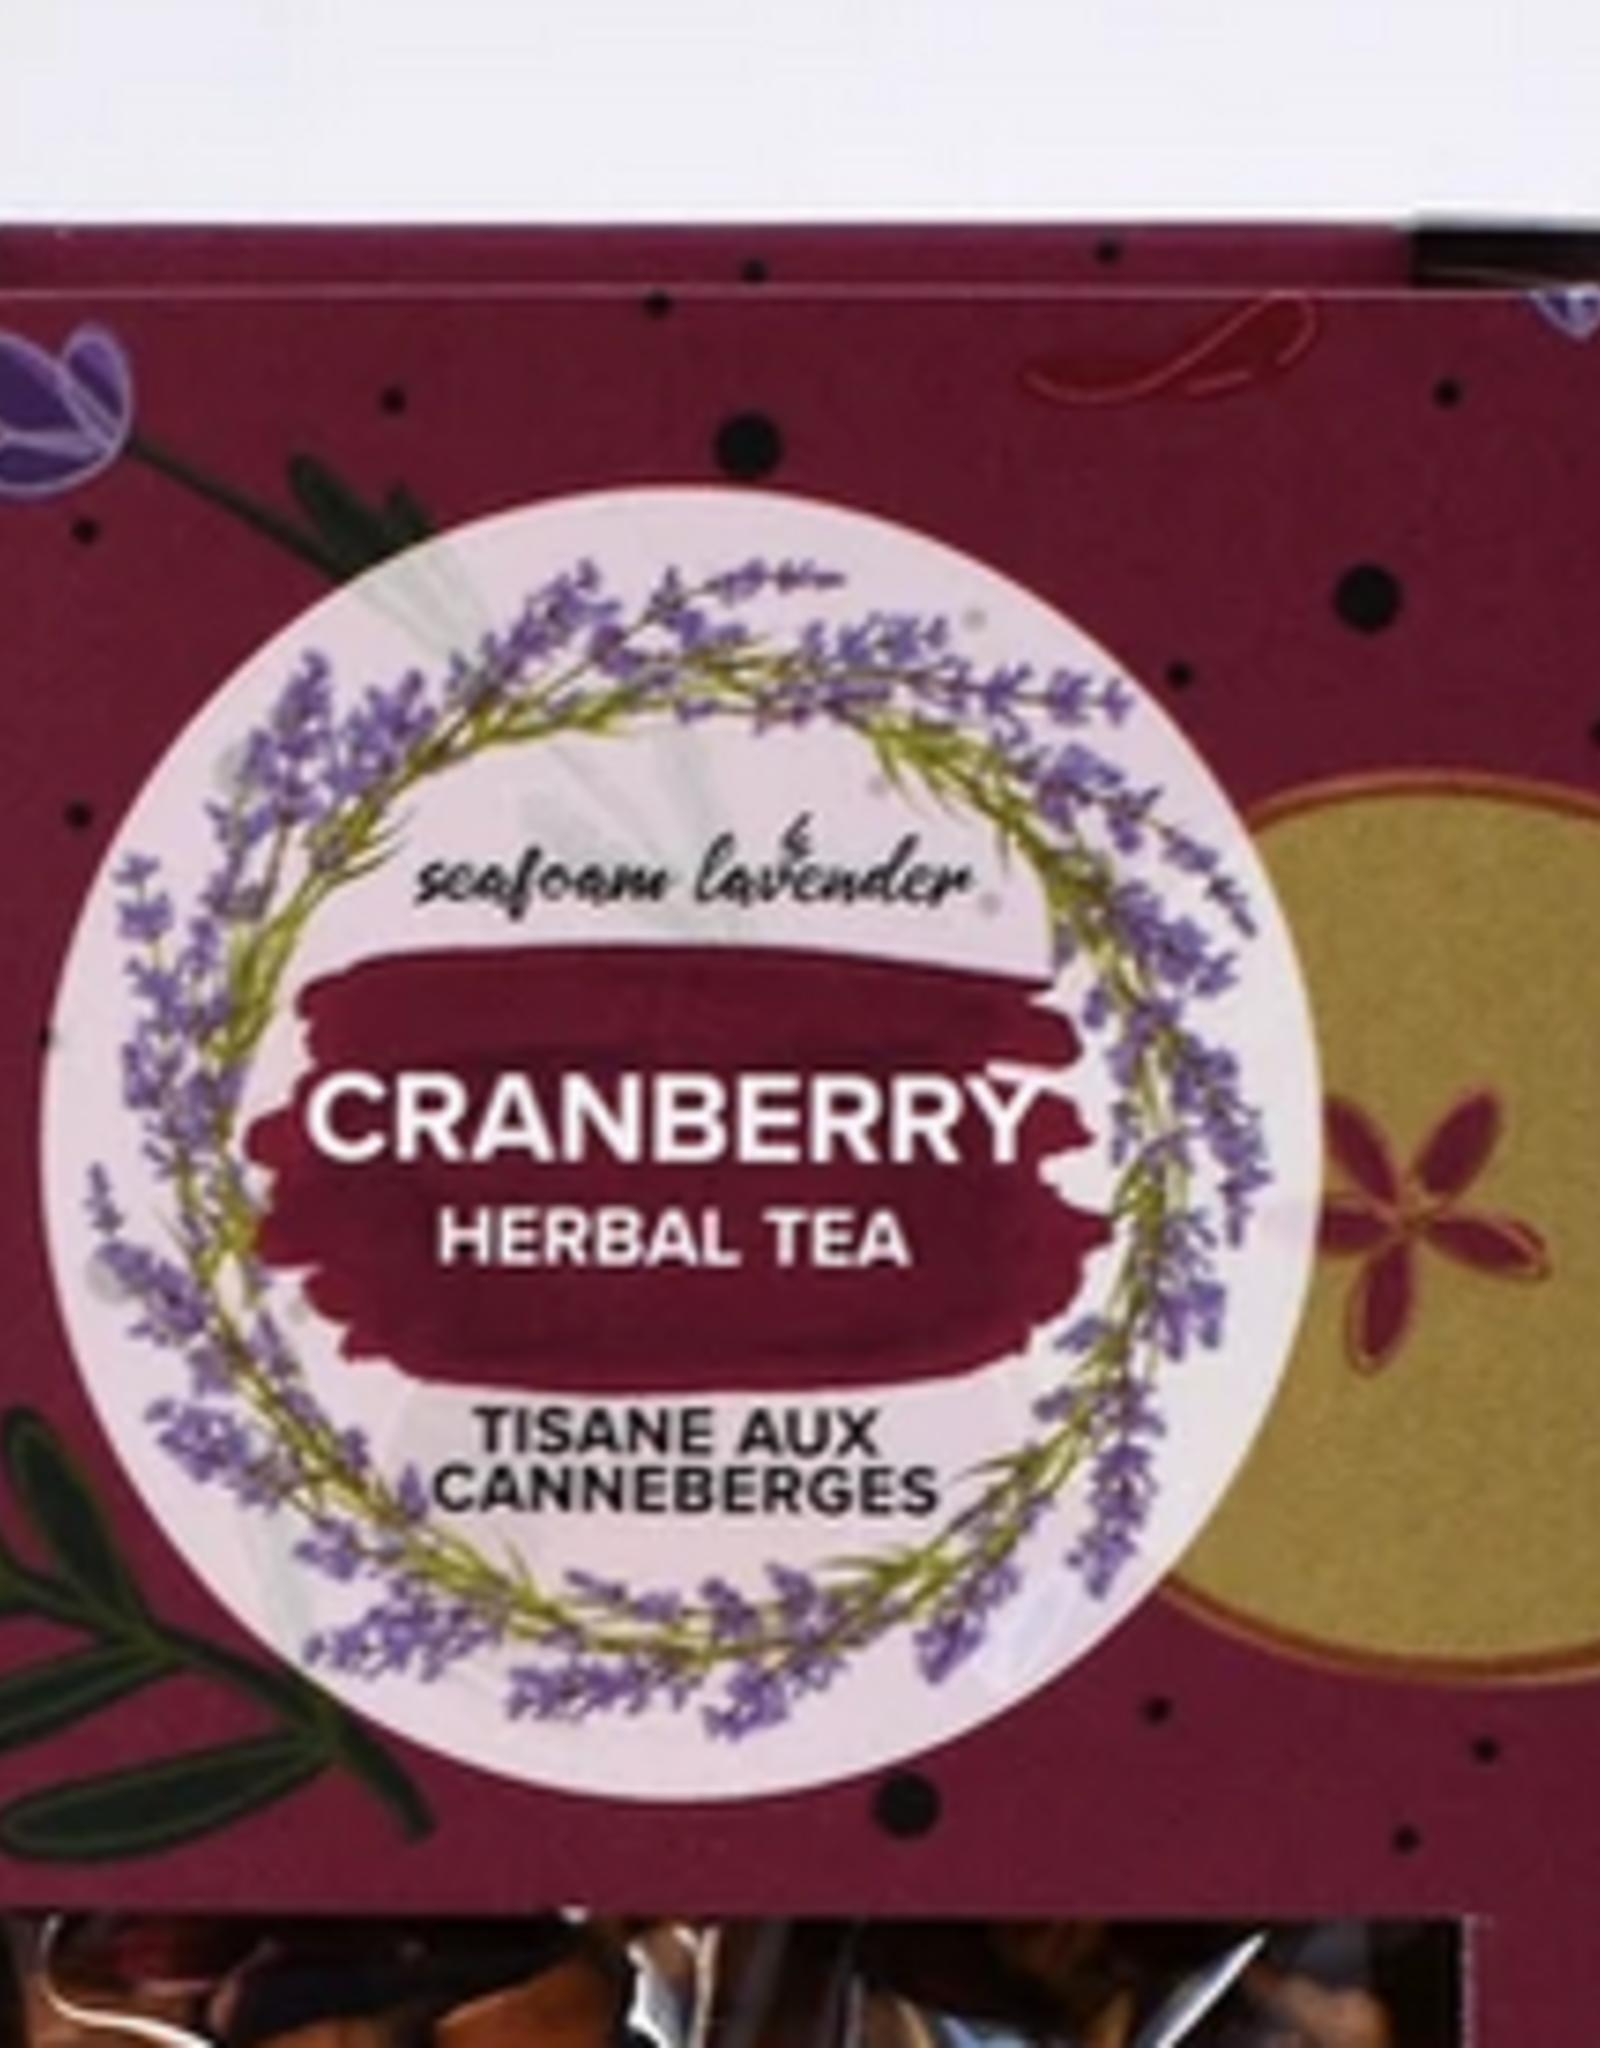 Seafoam & Lavender Cranberry Loose Leaf Tea 25 grams